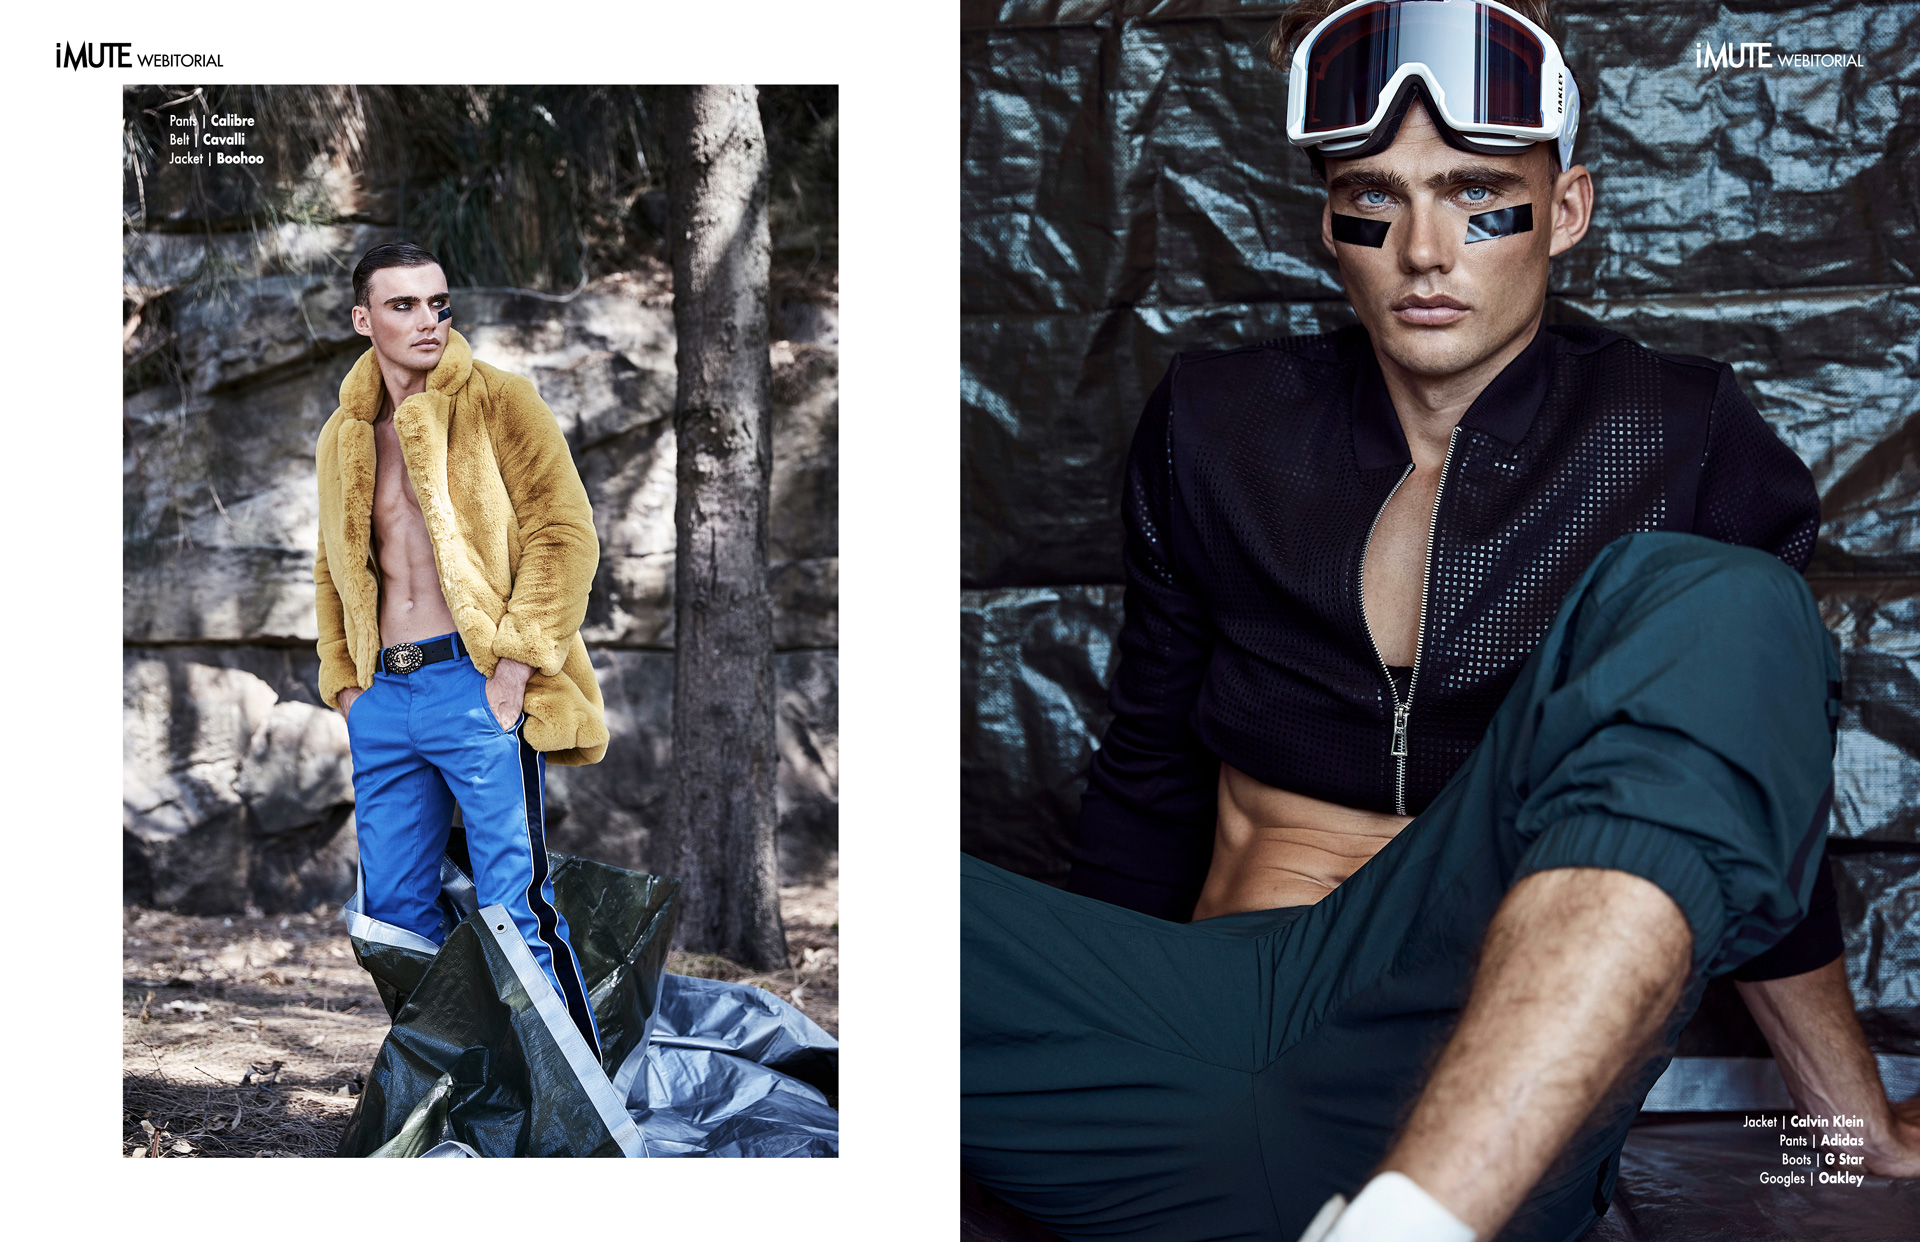 JOURNEYMAN webitorial for iMute Magazine Photographer Peter Brew Bevan @ work:agency Model  Jordan Barron @Chic Management Stylist Emma Cotterill Grooming Chris Arai @ Talentland